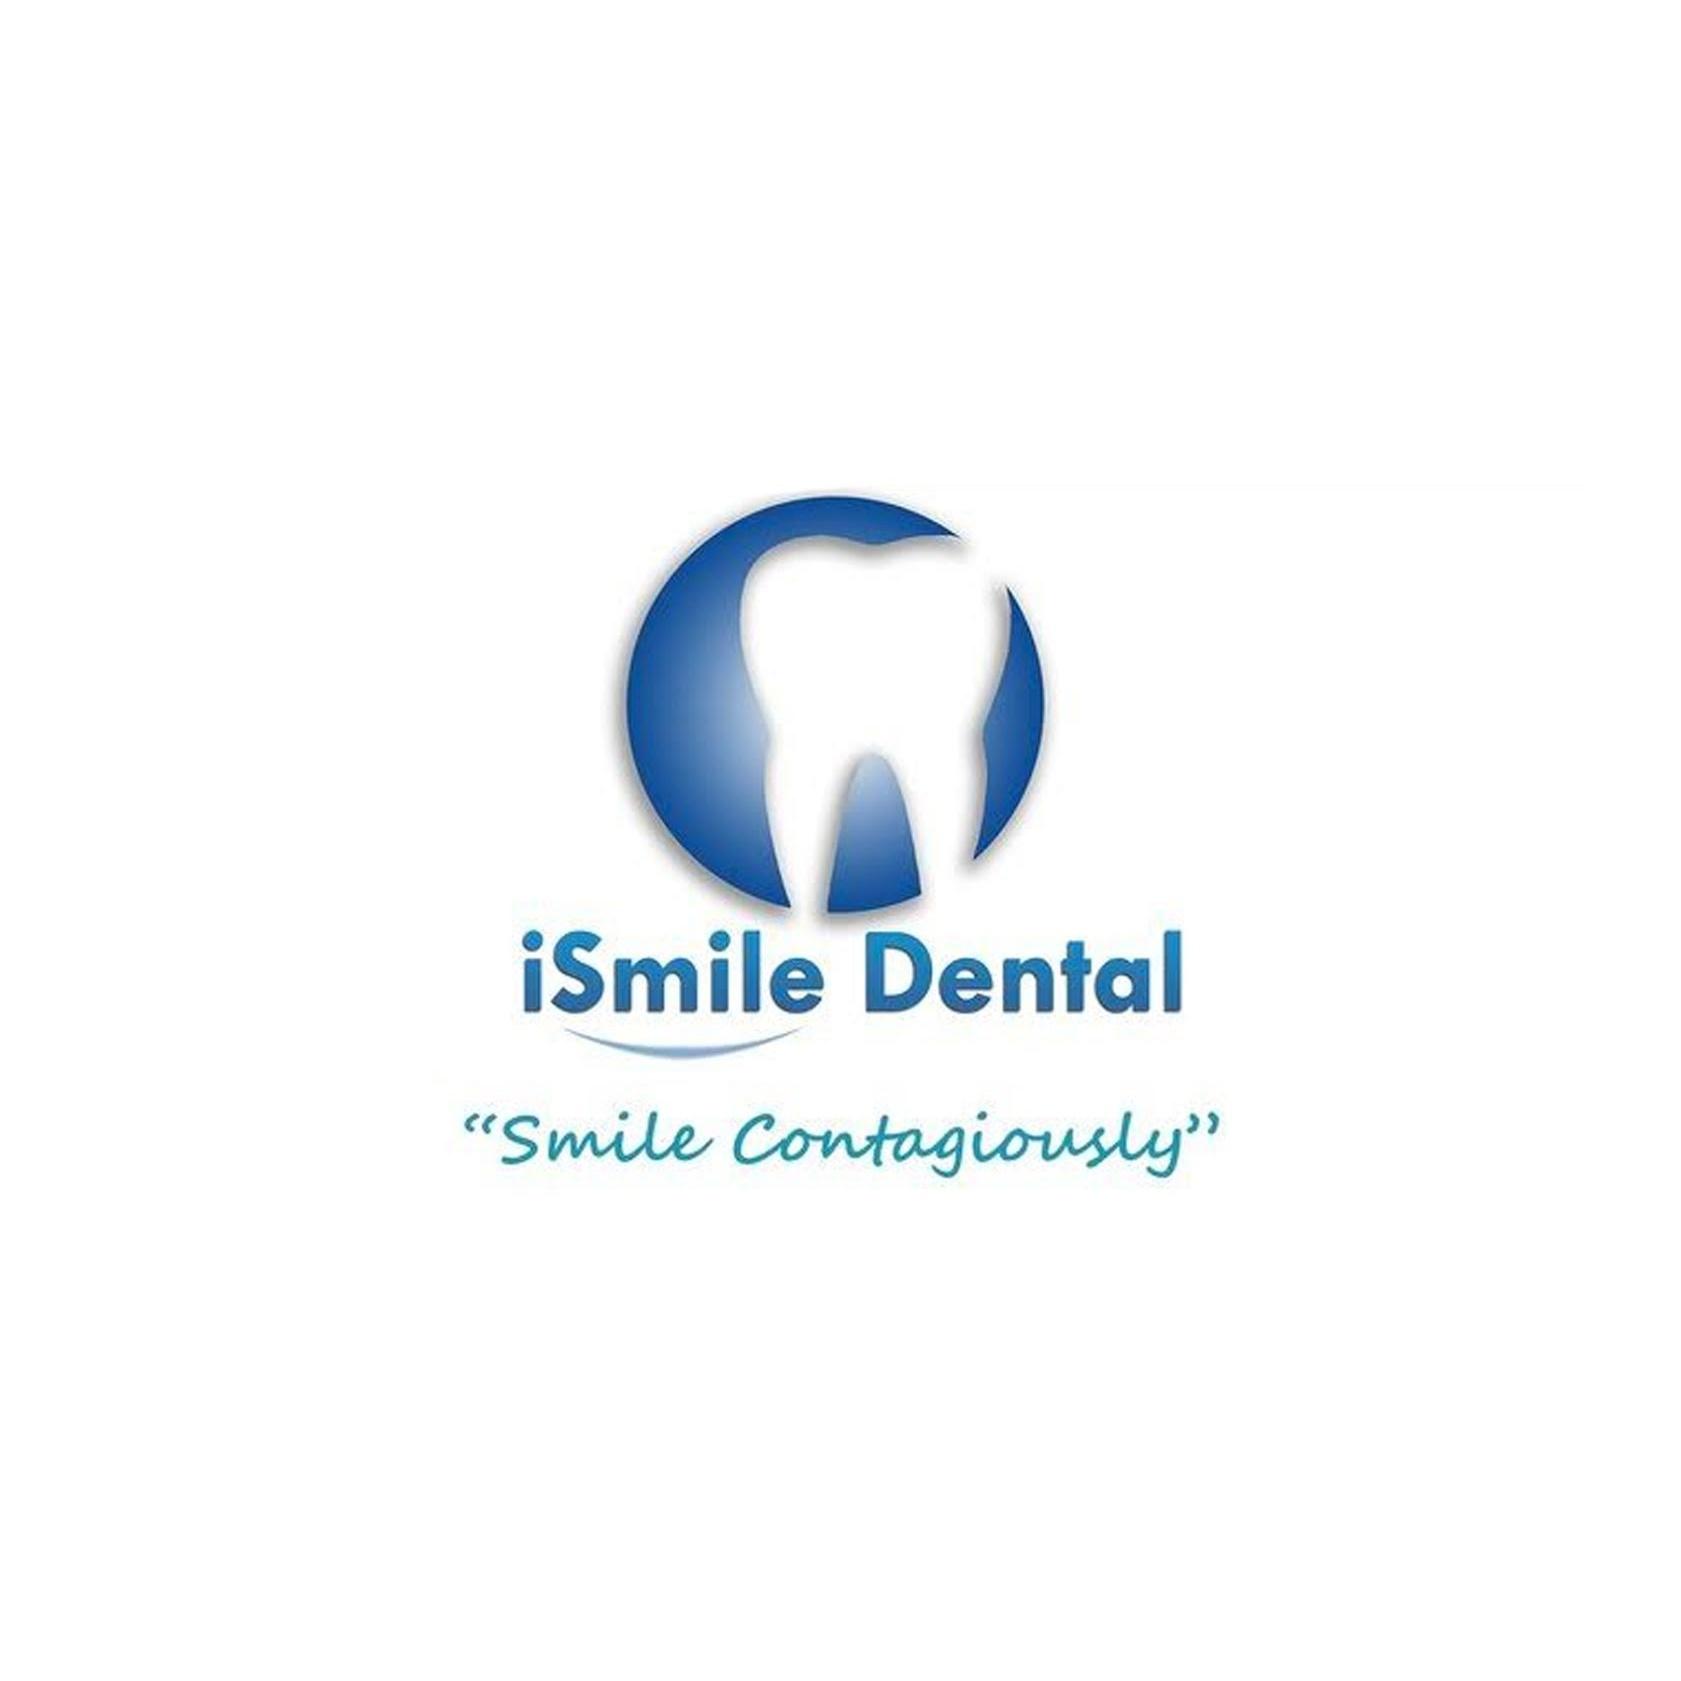 iSmile Dental